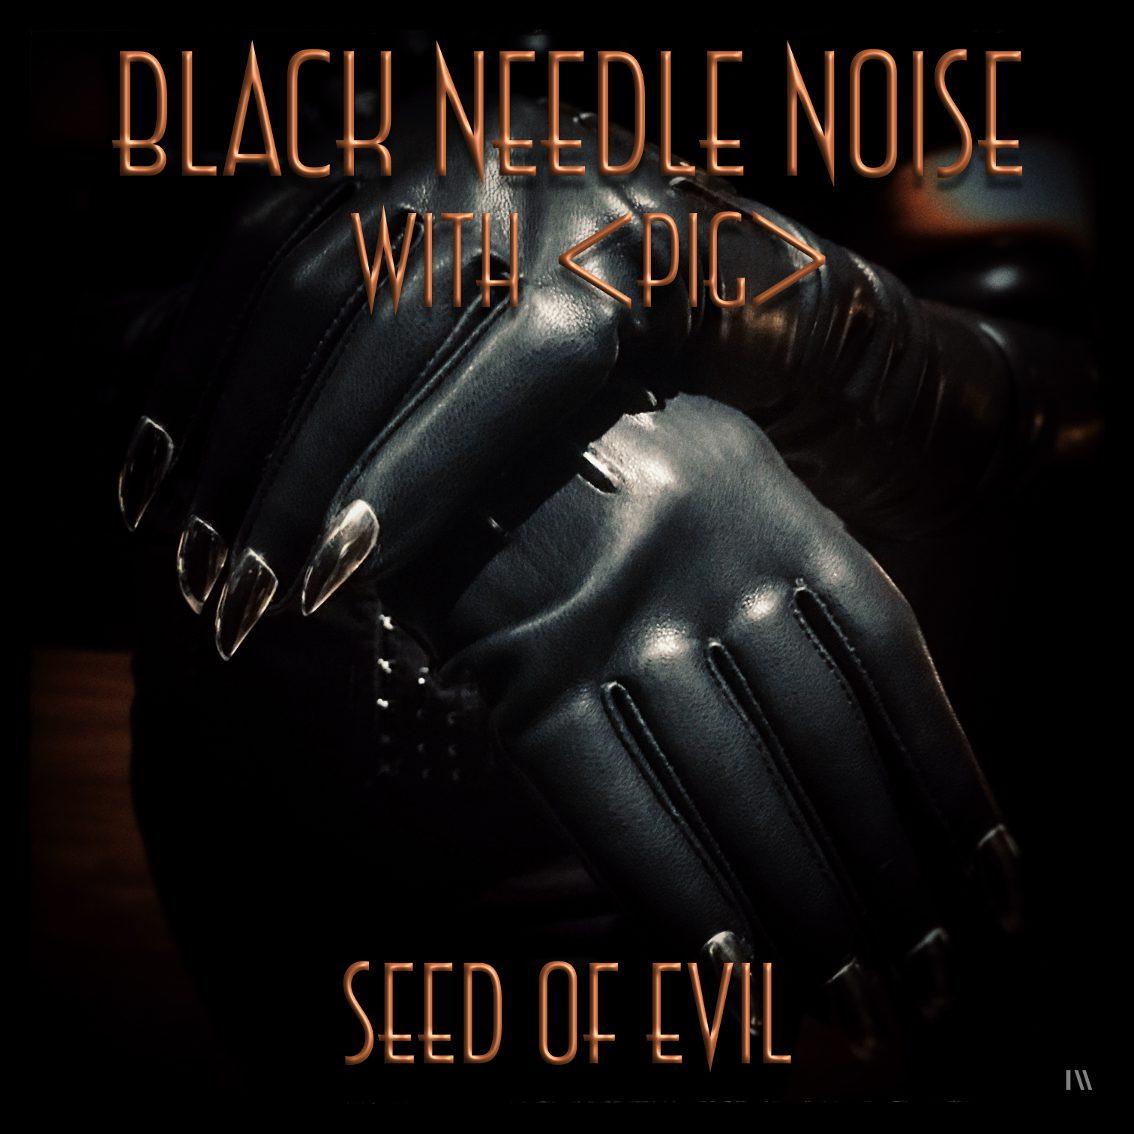 PIG vocalist Raymond Watts featured on new single Black Needle Noise - listen here